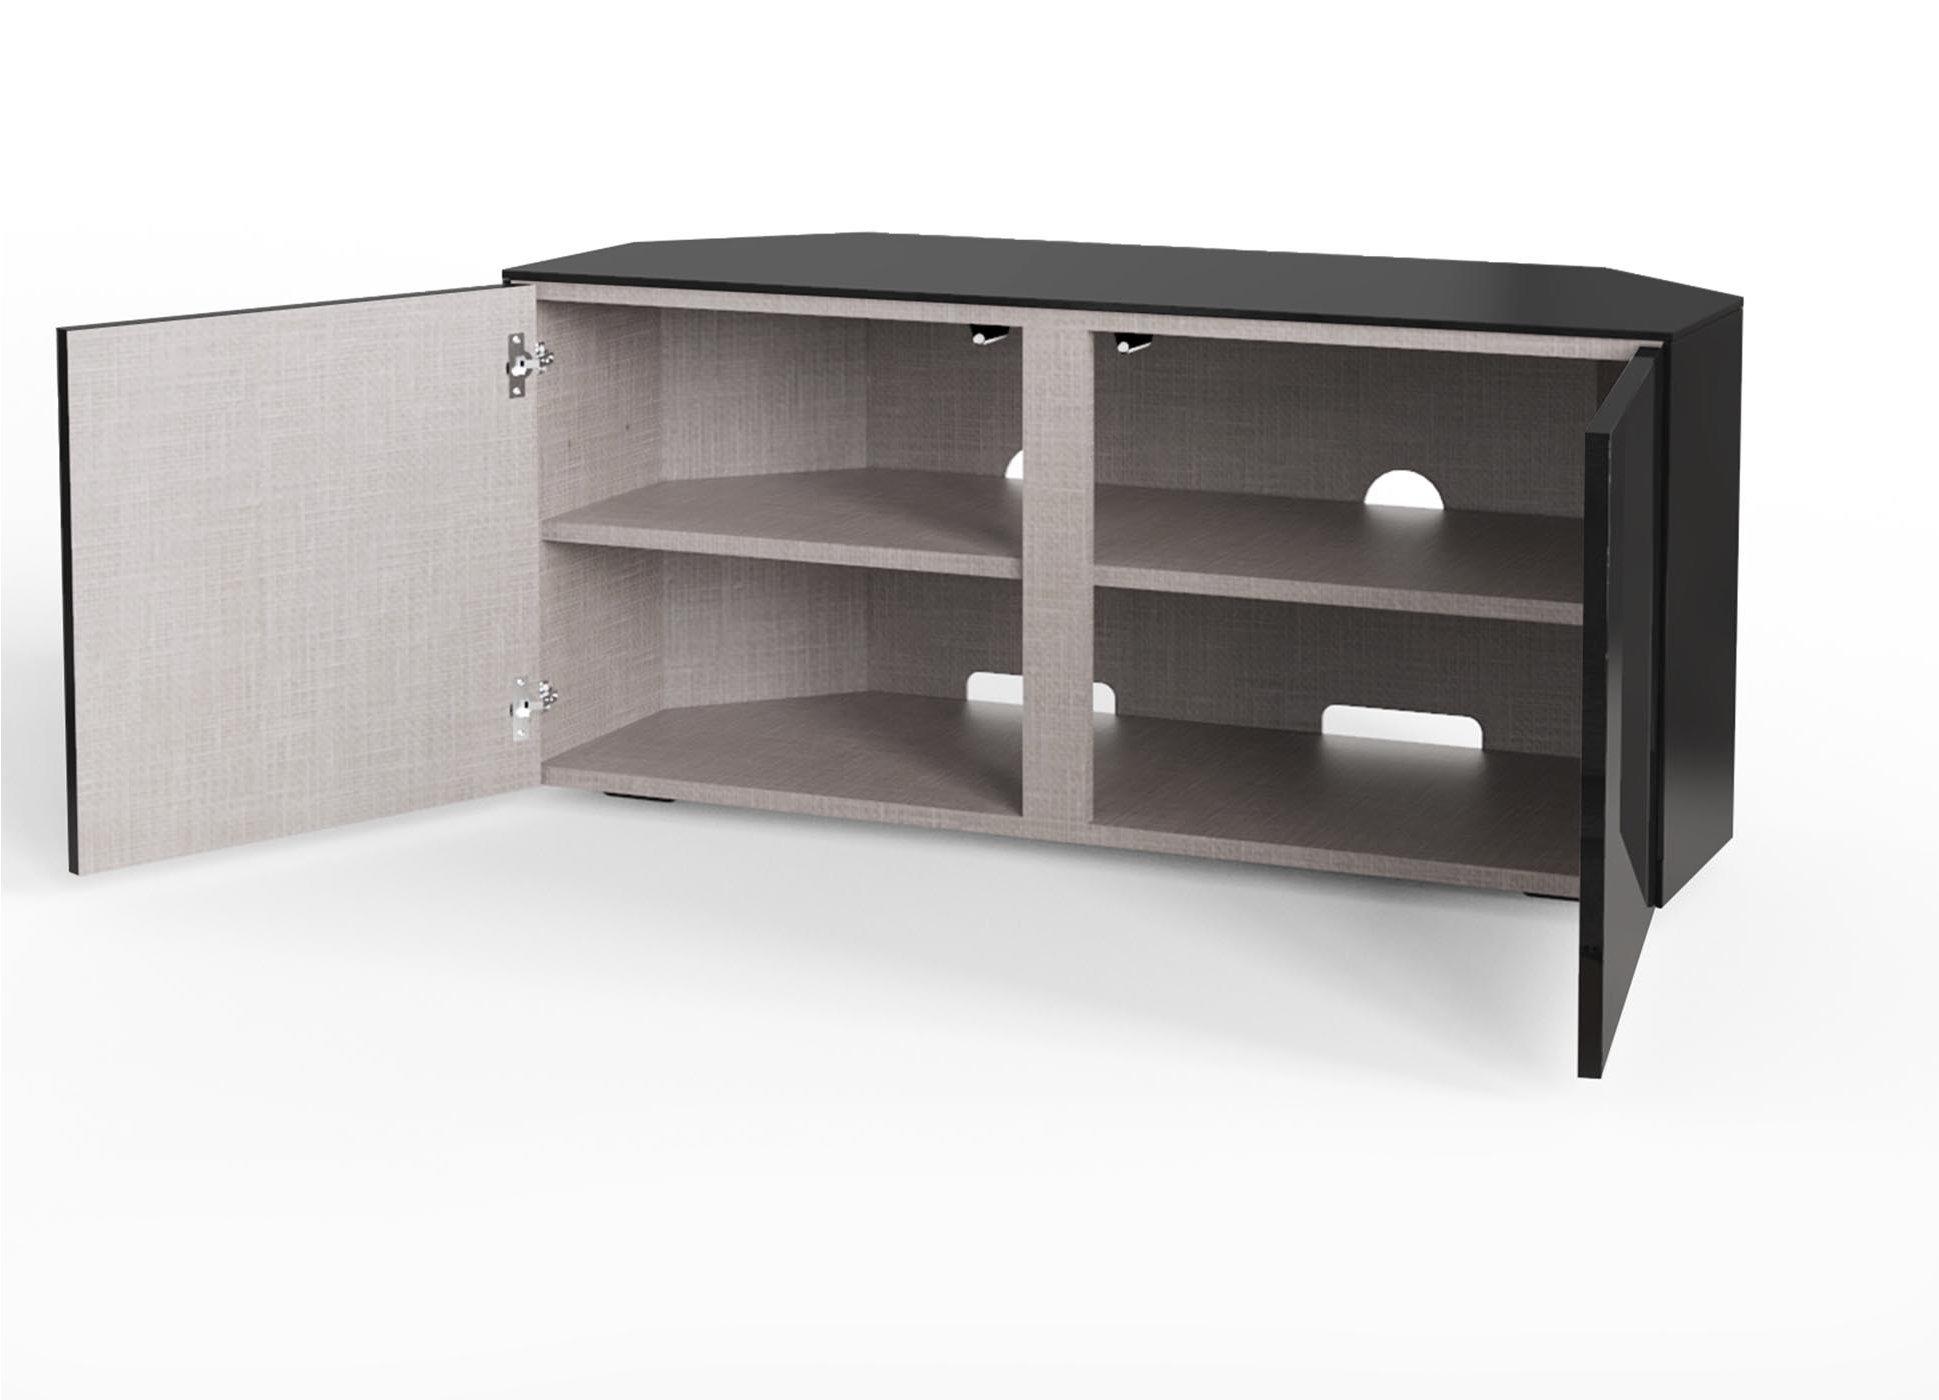 Frank Olsen Intel1100led Corner Blk Gloss Black Corner Tv Cabinet For Tvs Up To 50 Inch With Led Lighting And Alexa Compatibility